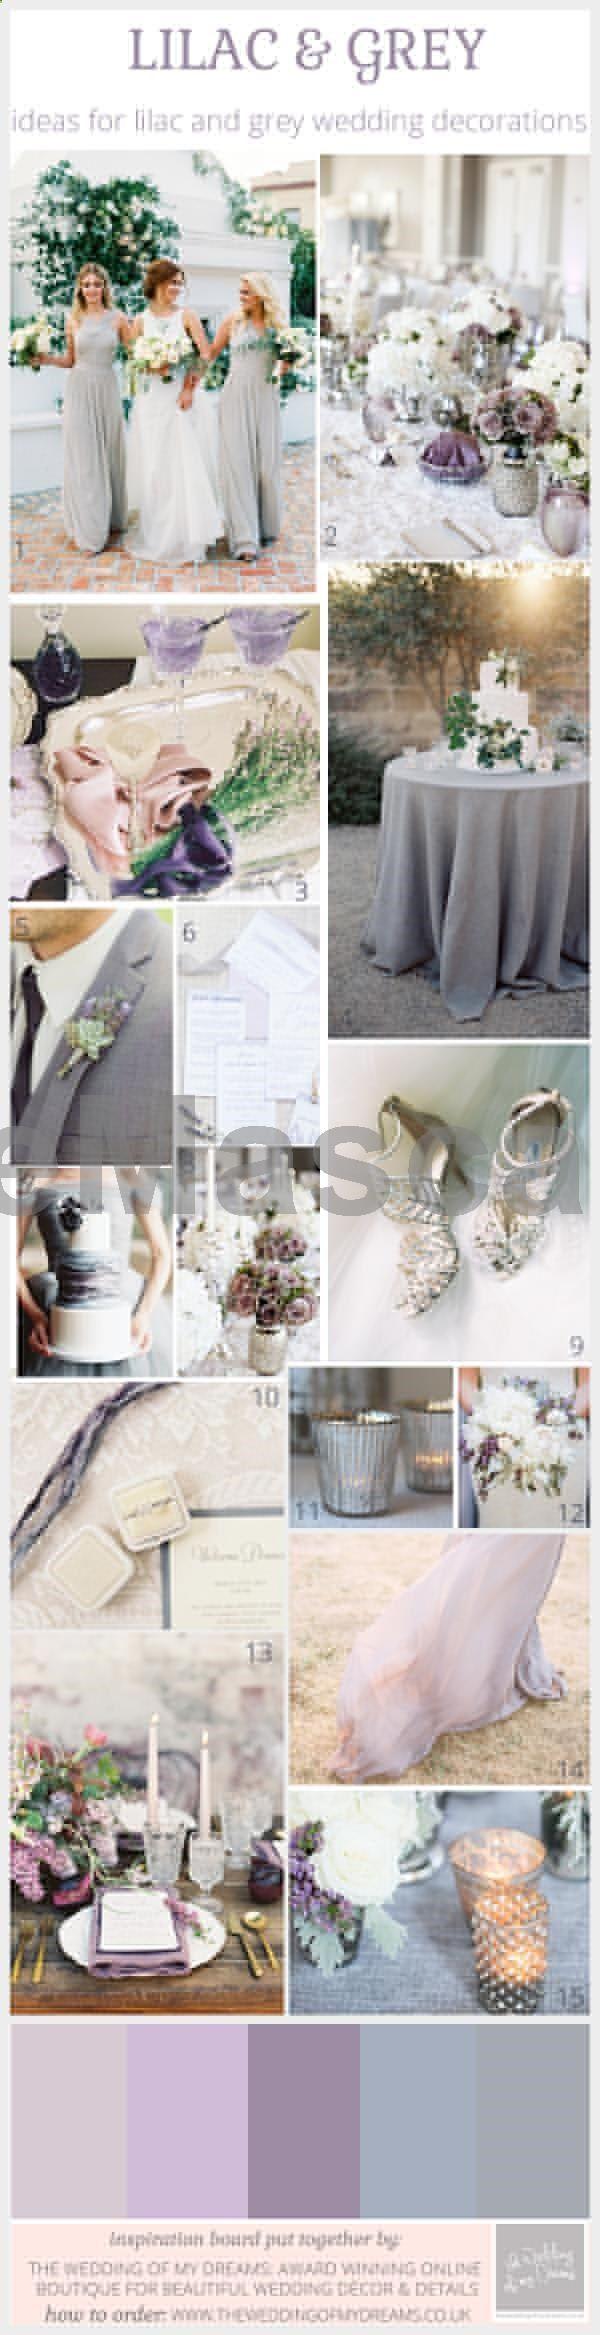 21 best Wedding videography images on Pinterest | Wedding videos ...